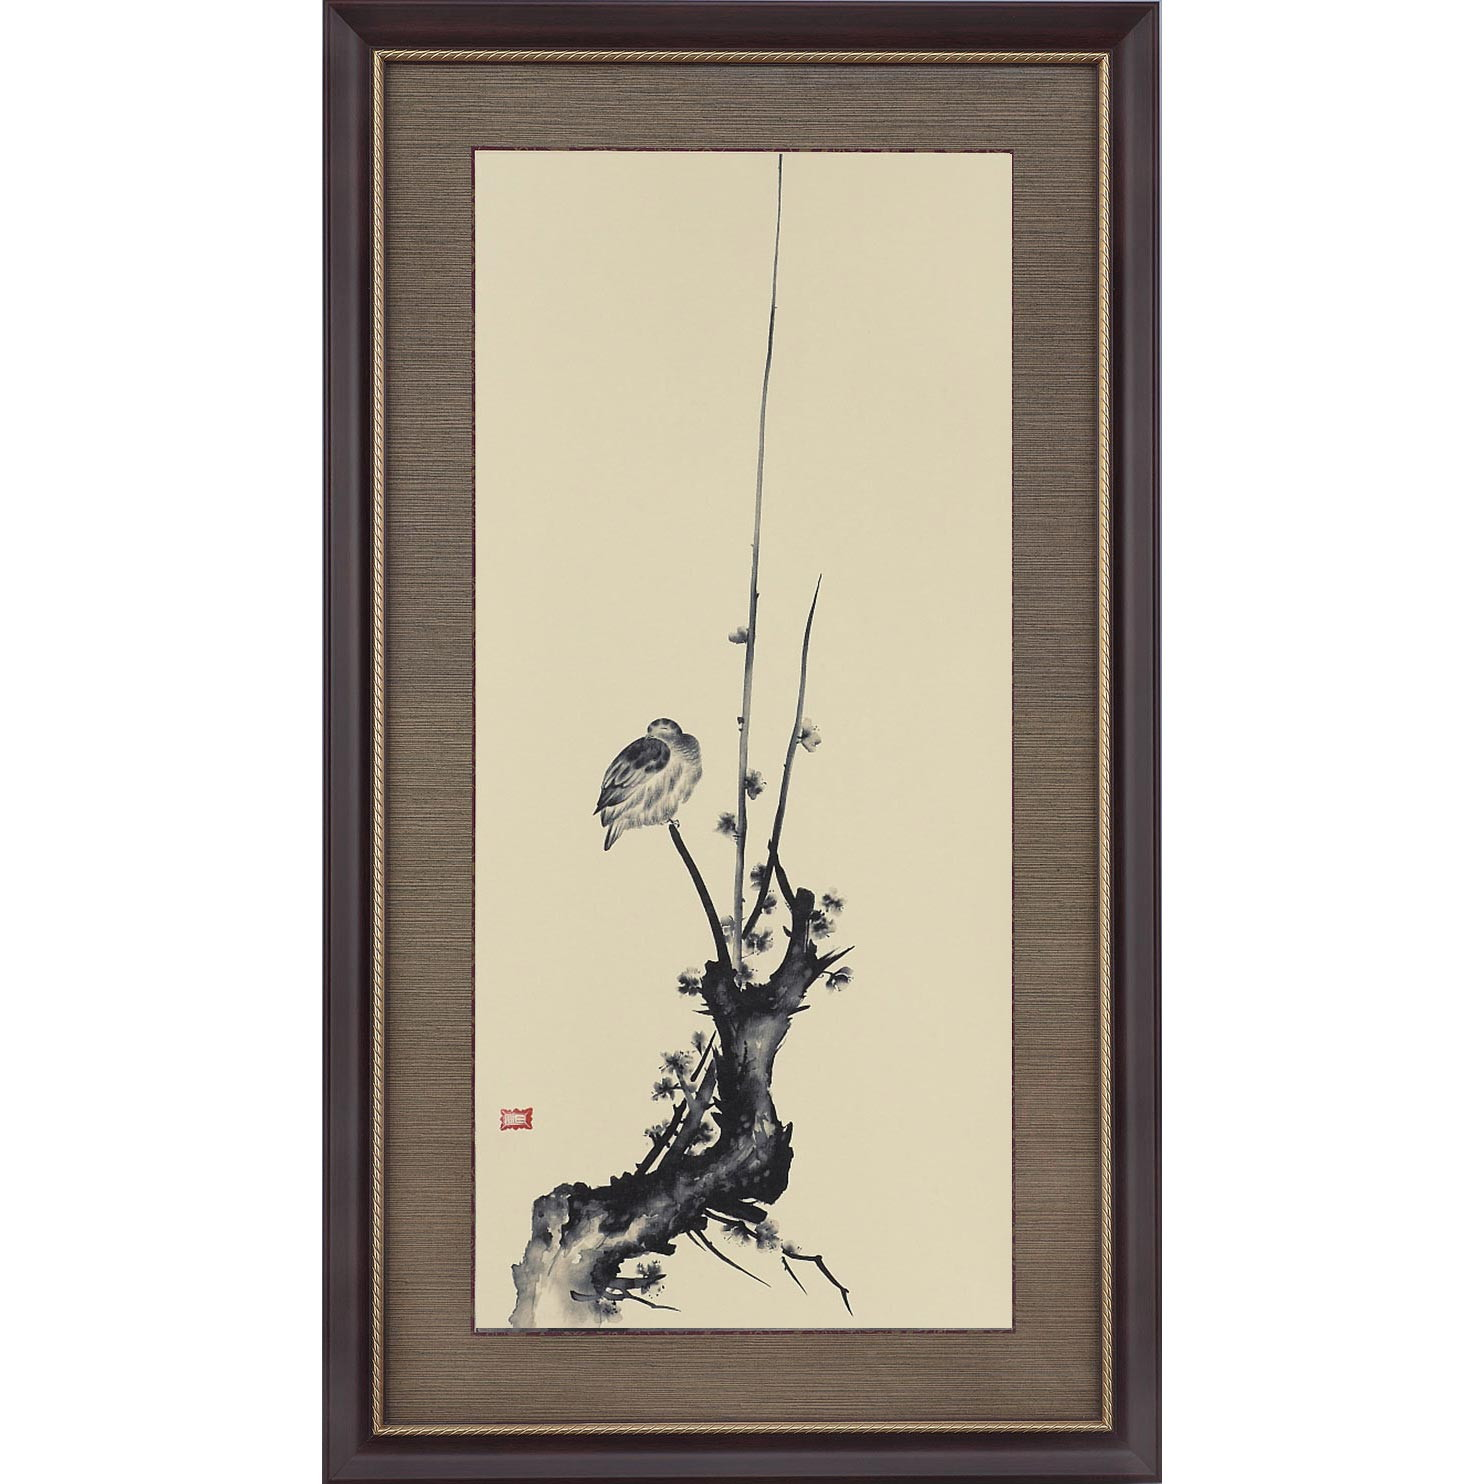 宮本武蔵 紅梅鳩図 複製絵画 額装 美術品 レプリカ